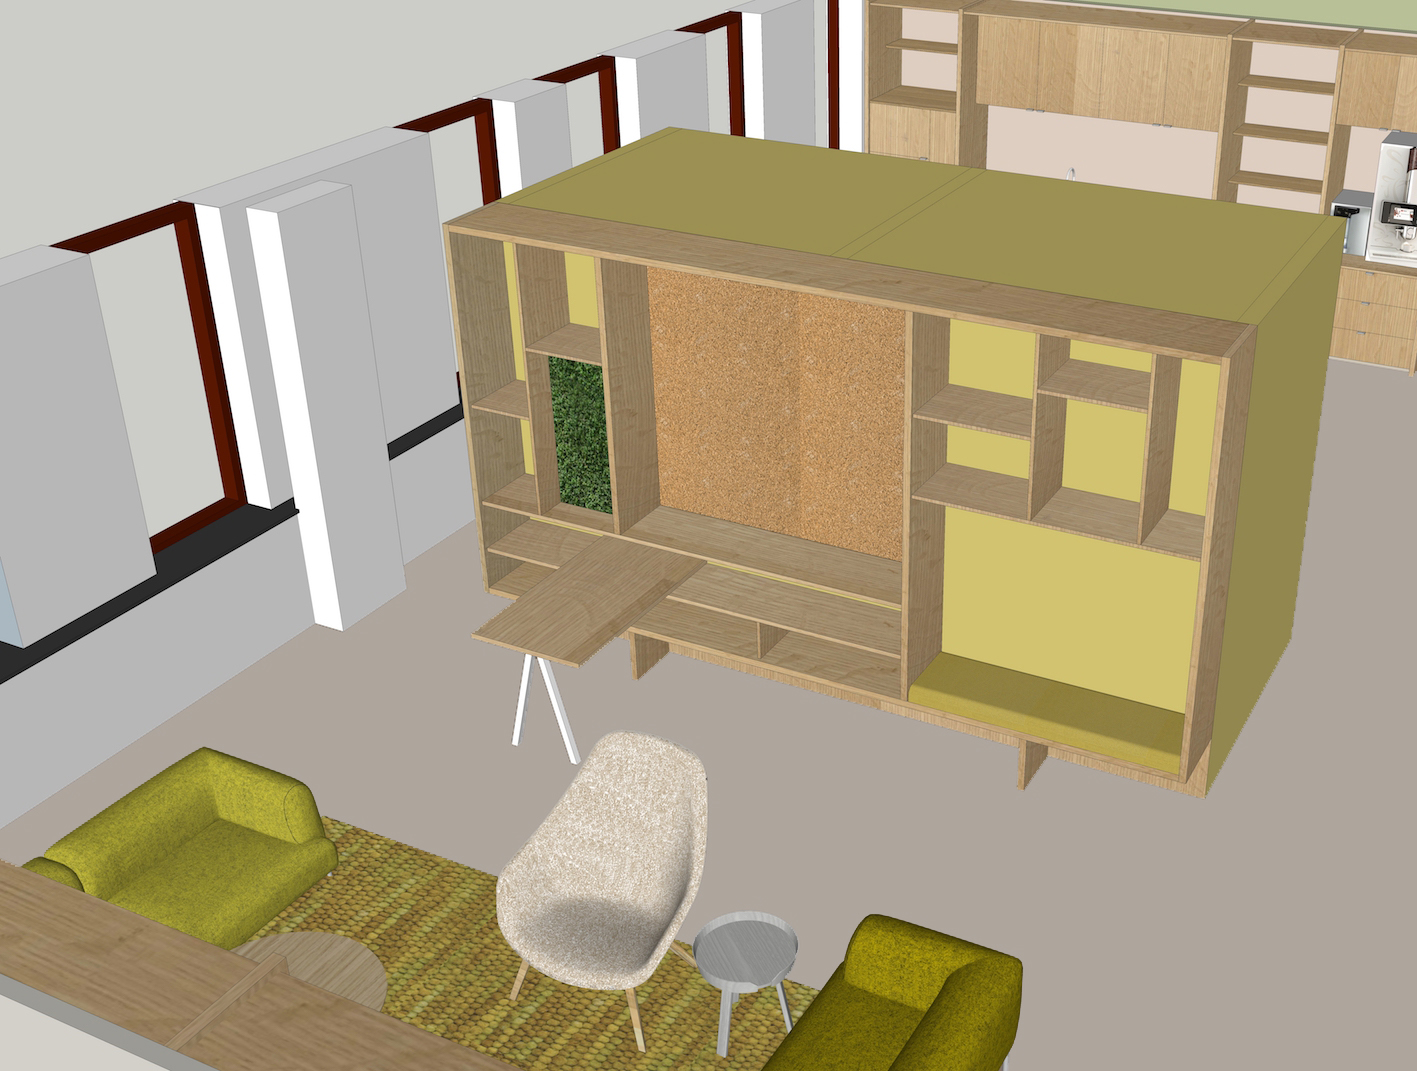 b&l design 3e 3d